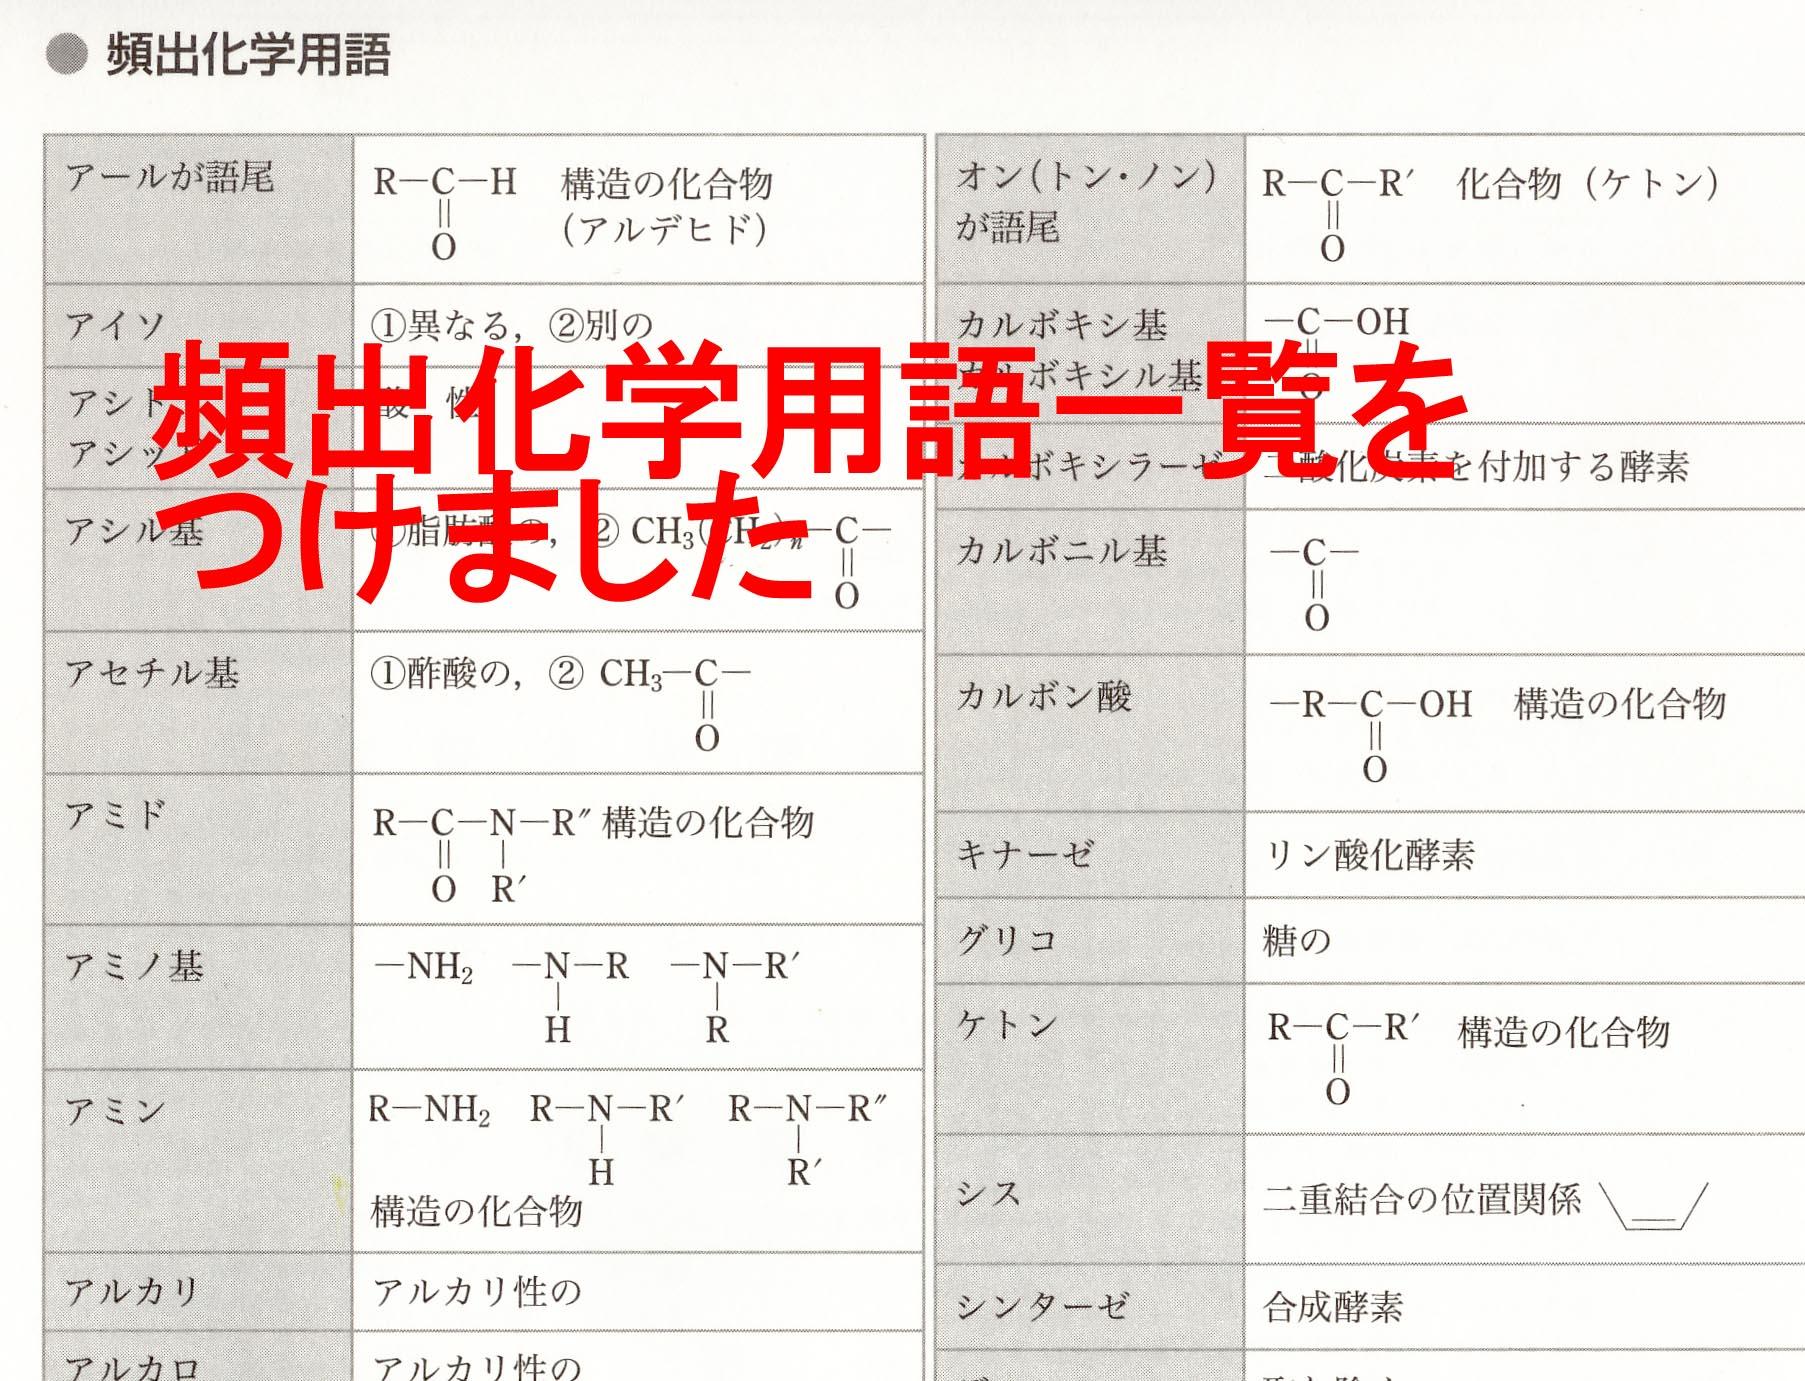 http://nutr.food.sugiyama-u.ac.jp/blog/006/images/asakura41.jpg